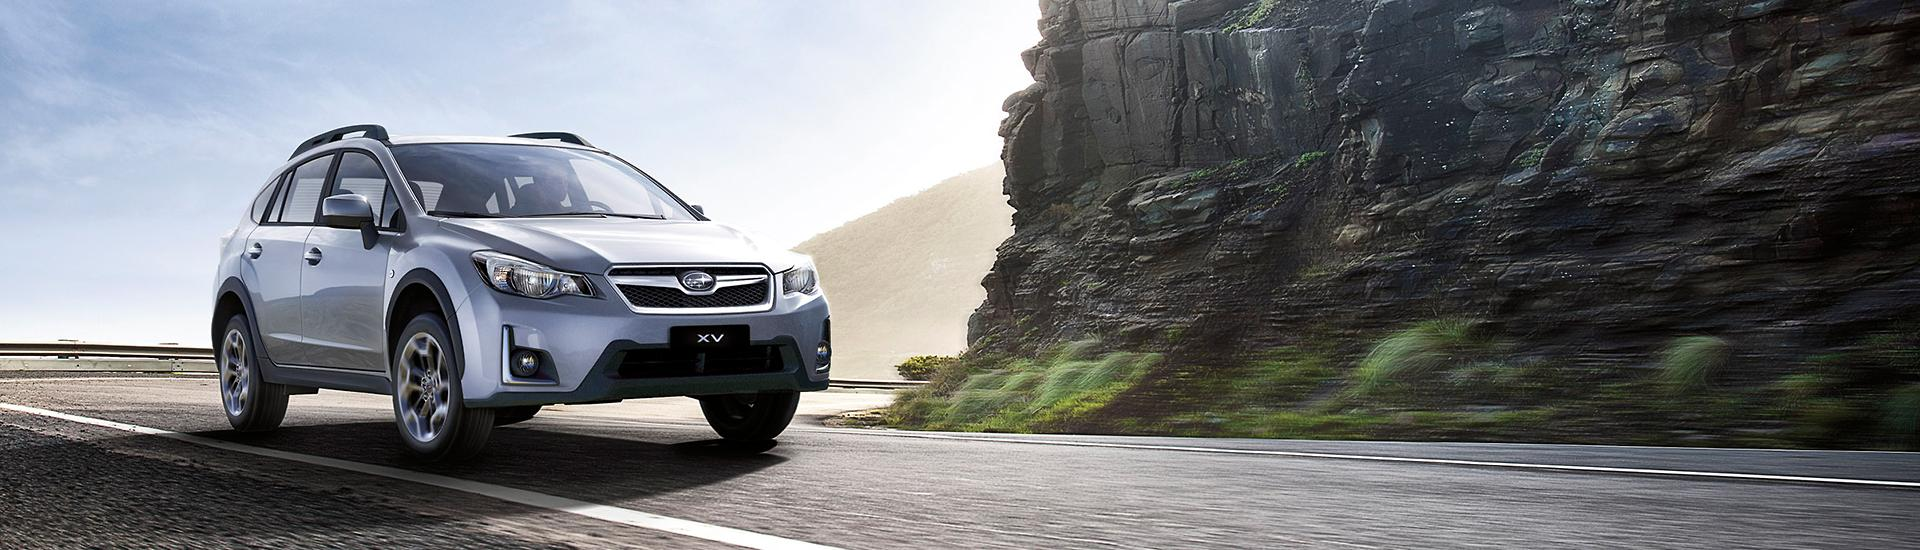 New Subaru Cars for Sale in Australia - carsales.com.au